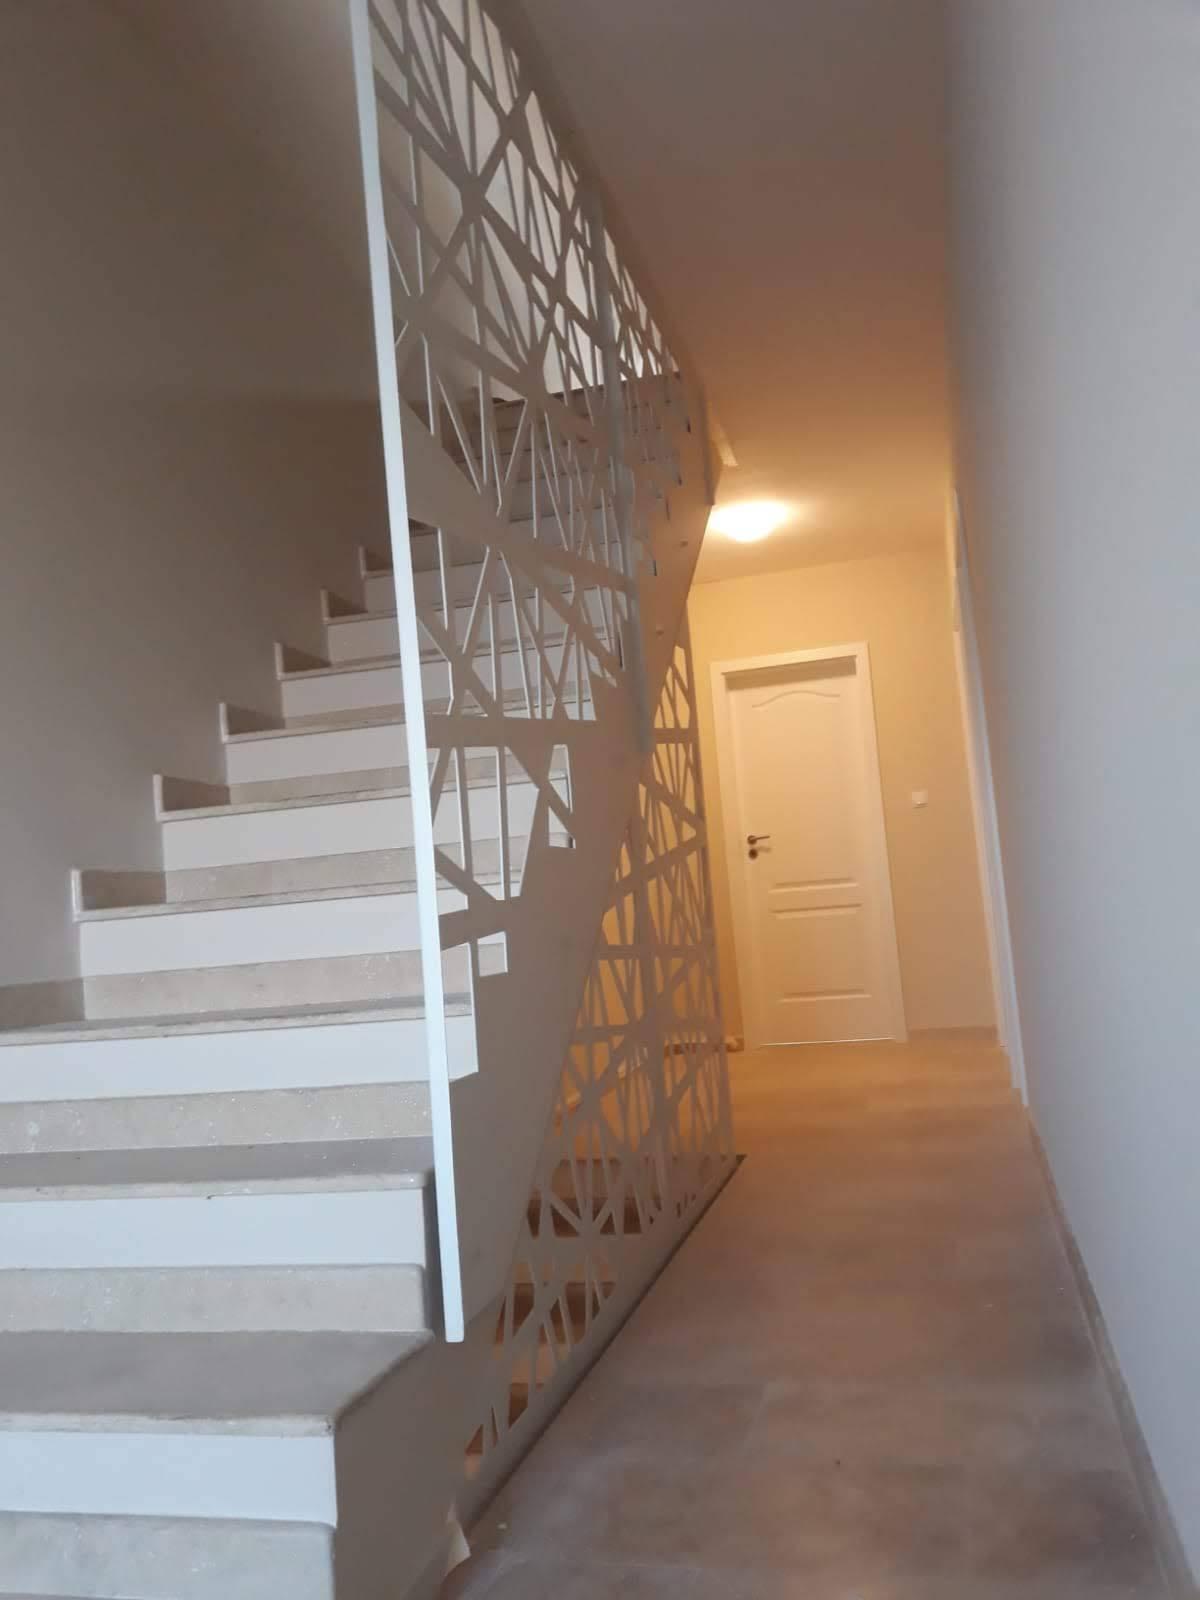 panou decorativ metalic alb pe post de parapete la o scara interioara